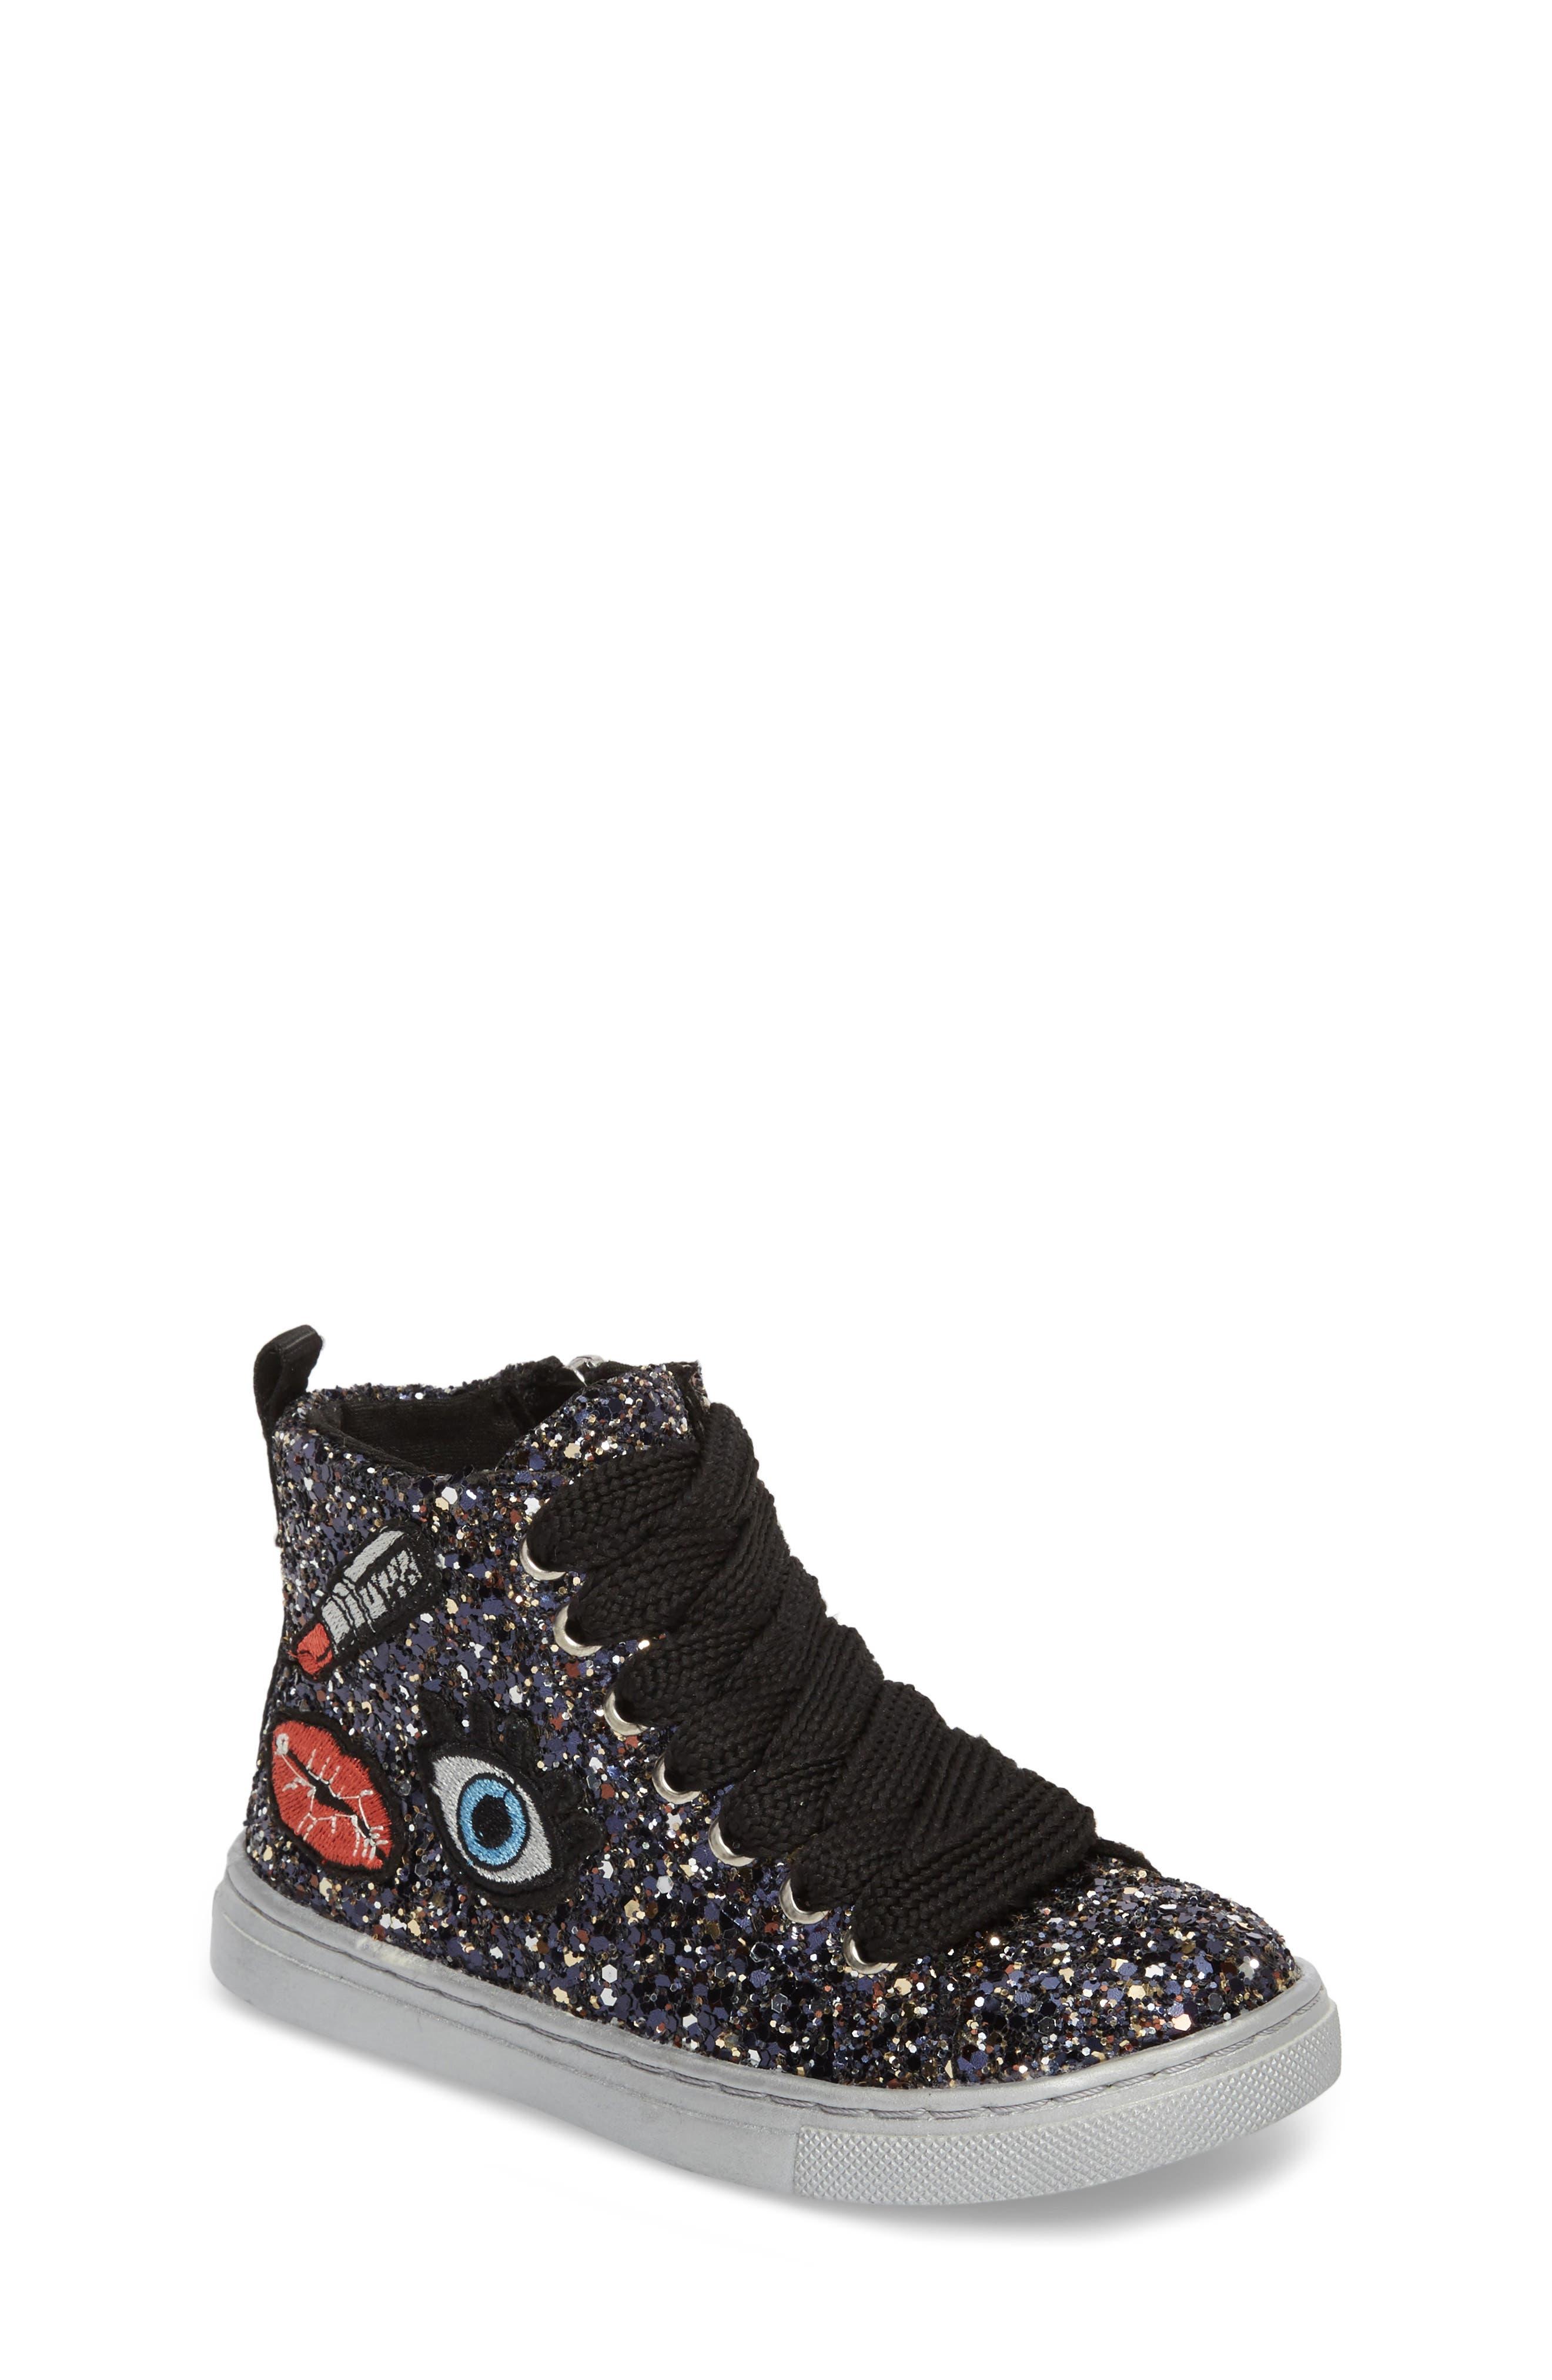 Zaine Glittery High Top Sneaker,                             Main thumbnail 1, color,                             Black Multi Glitter